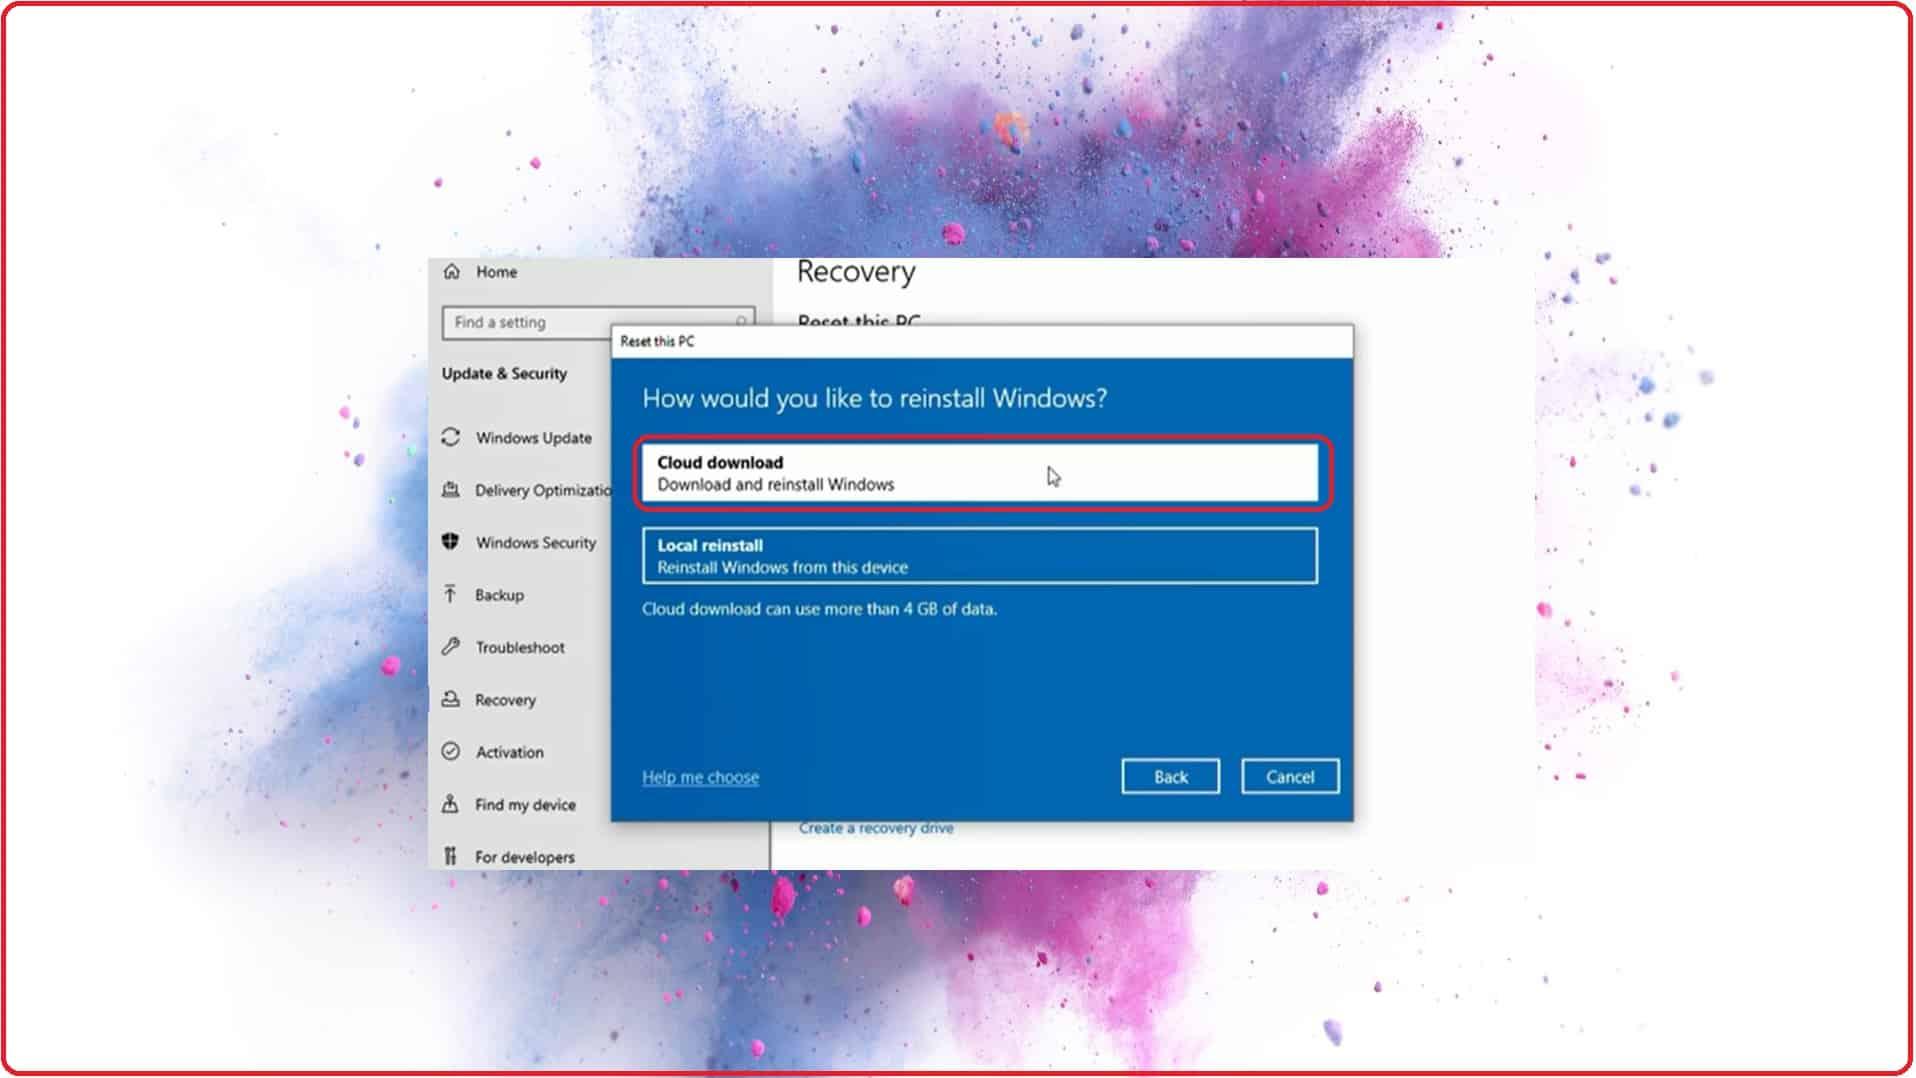 Windows 10 Cloud Recovery